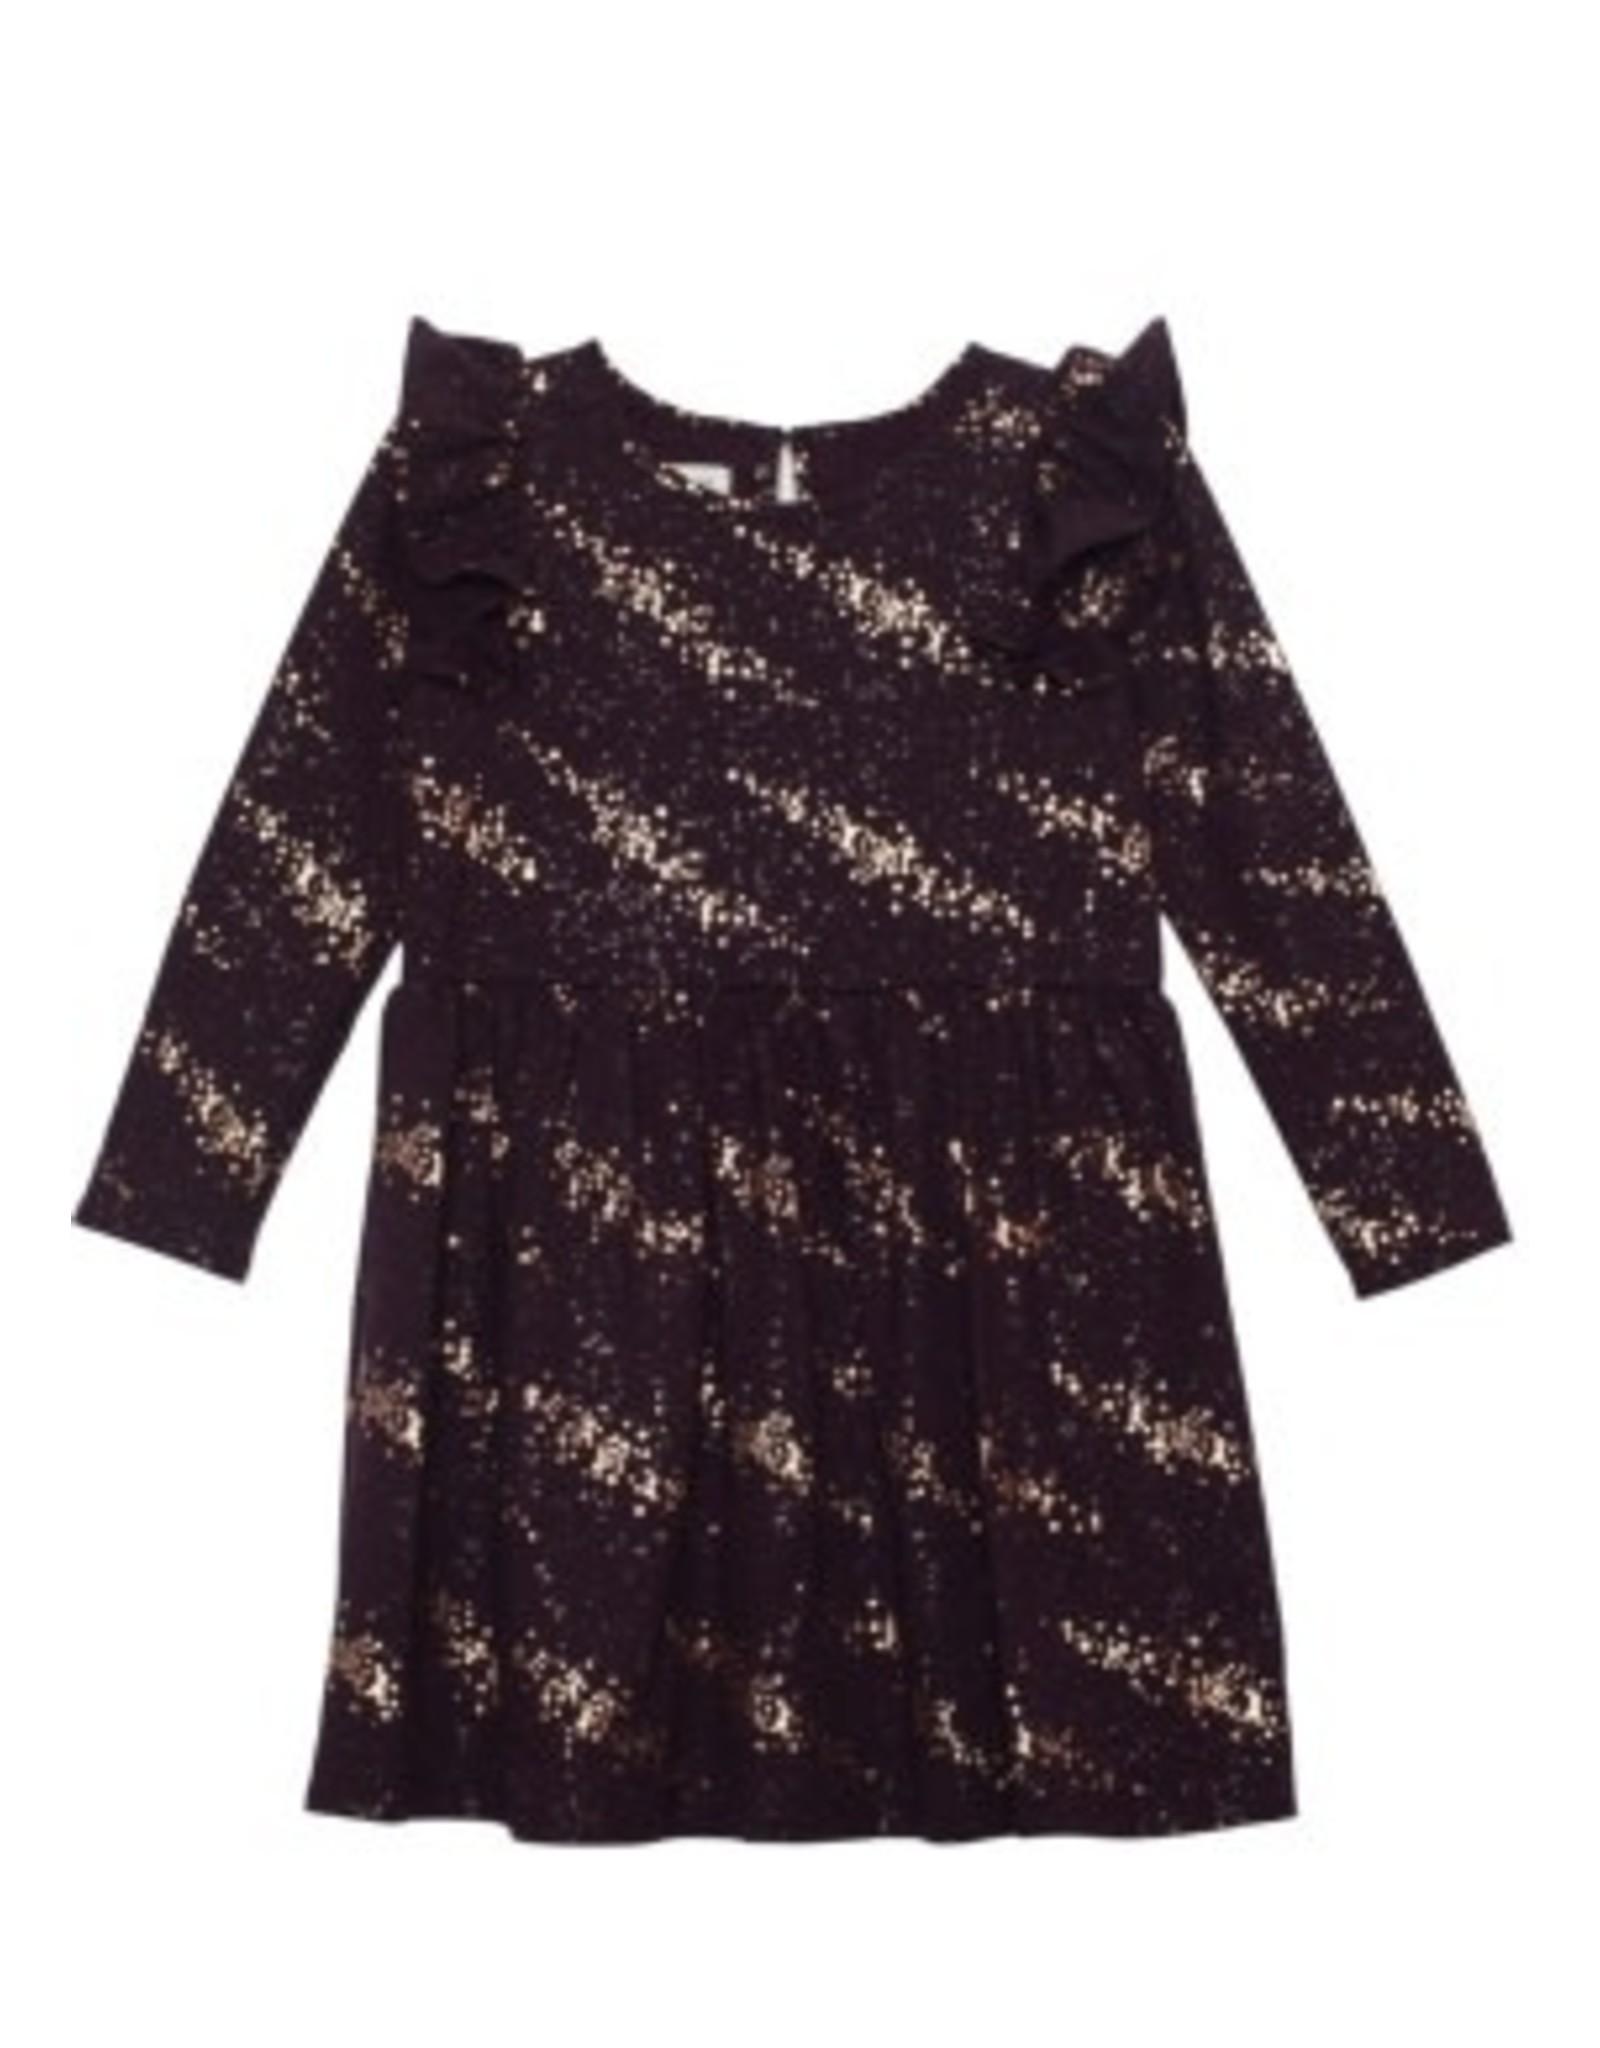 Isobella & Chloe Isobella & Chloe- Galaxy Knit Dress: Purple